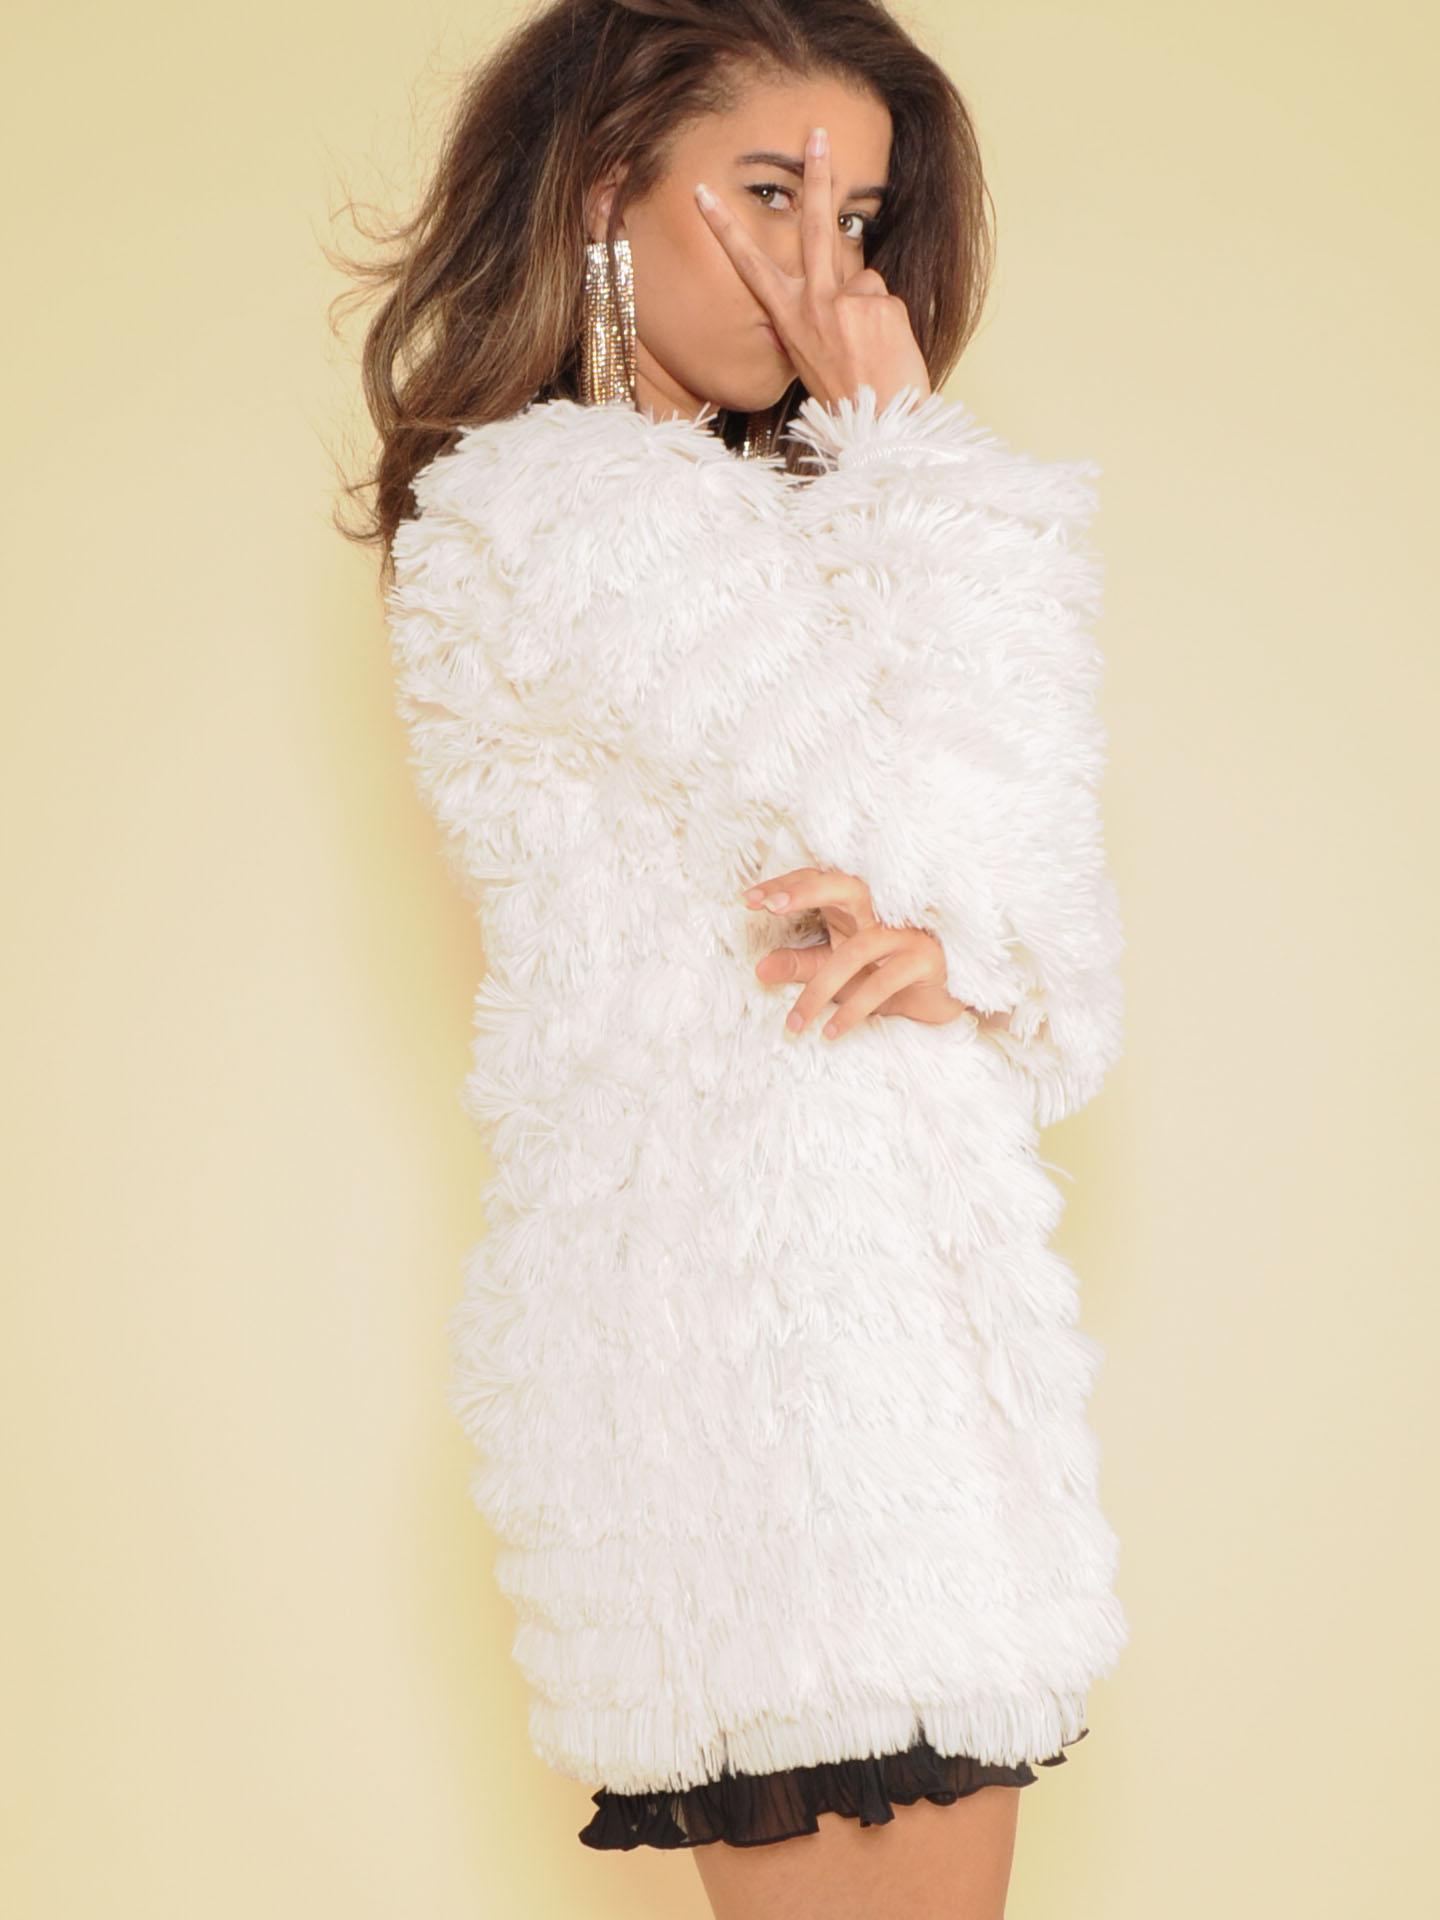 Myla Jacket Soft Cream Tassel Layer Side